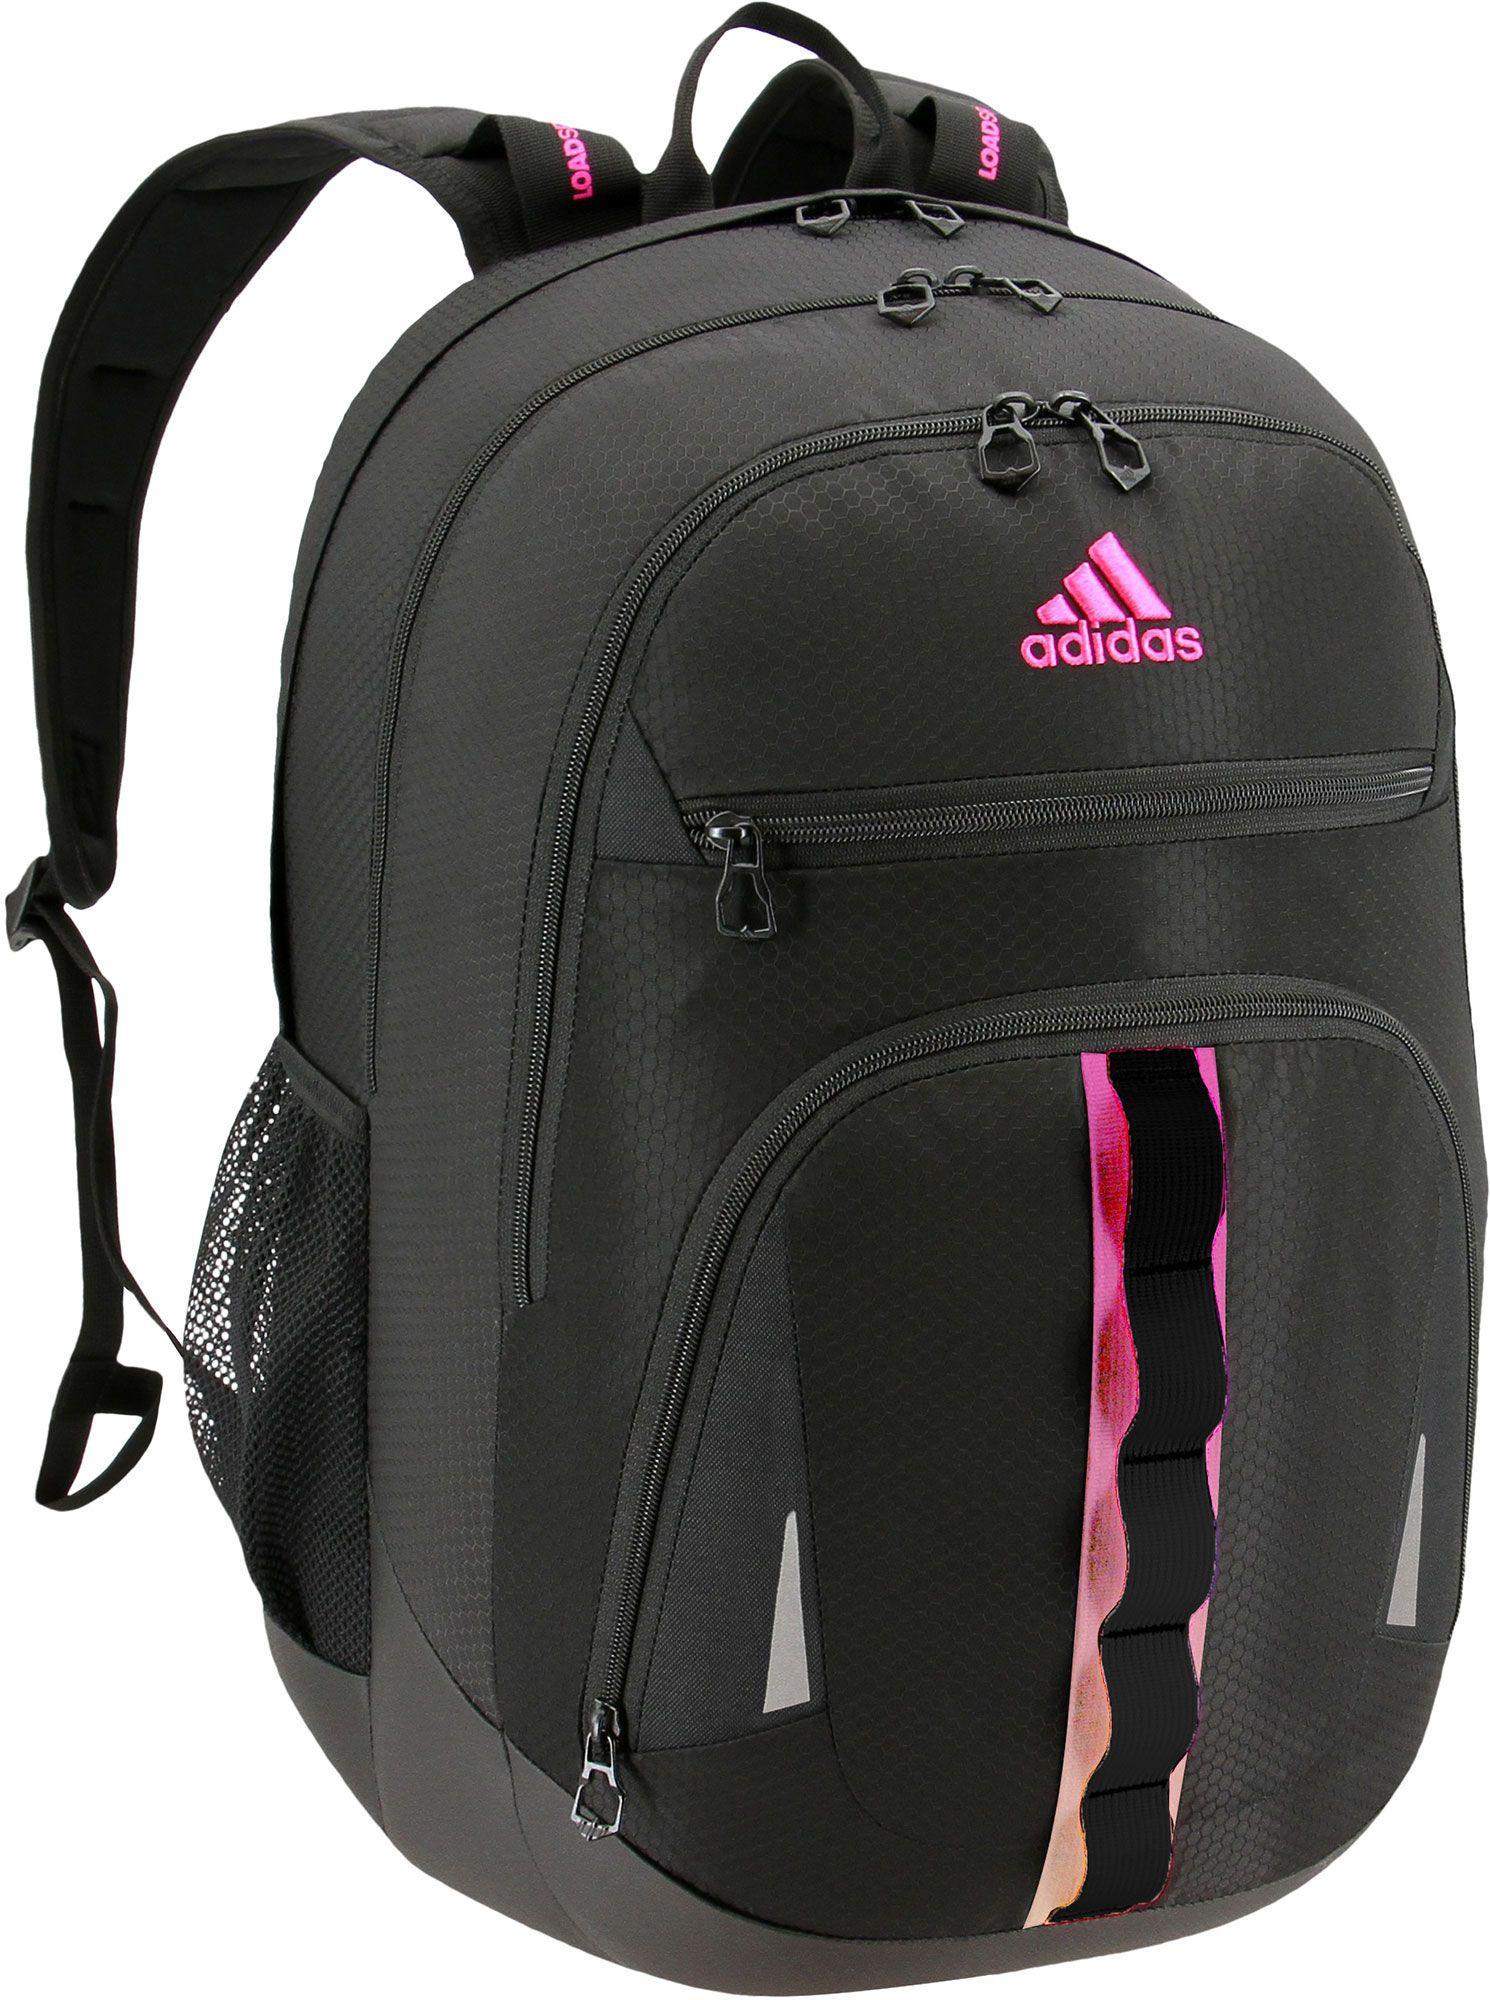 Lyst - adidas Prime Iv Backpack in Black 7ccf335a7ef13